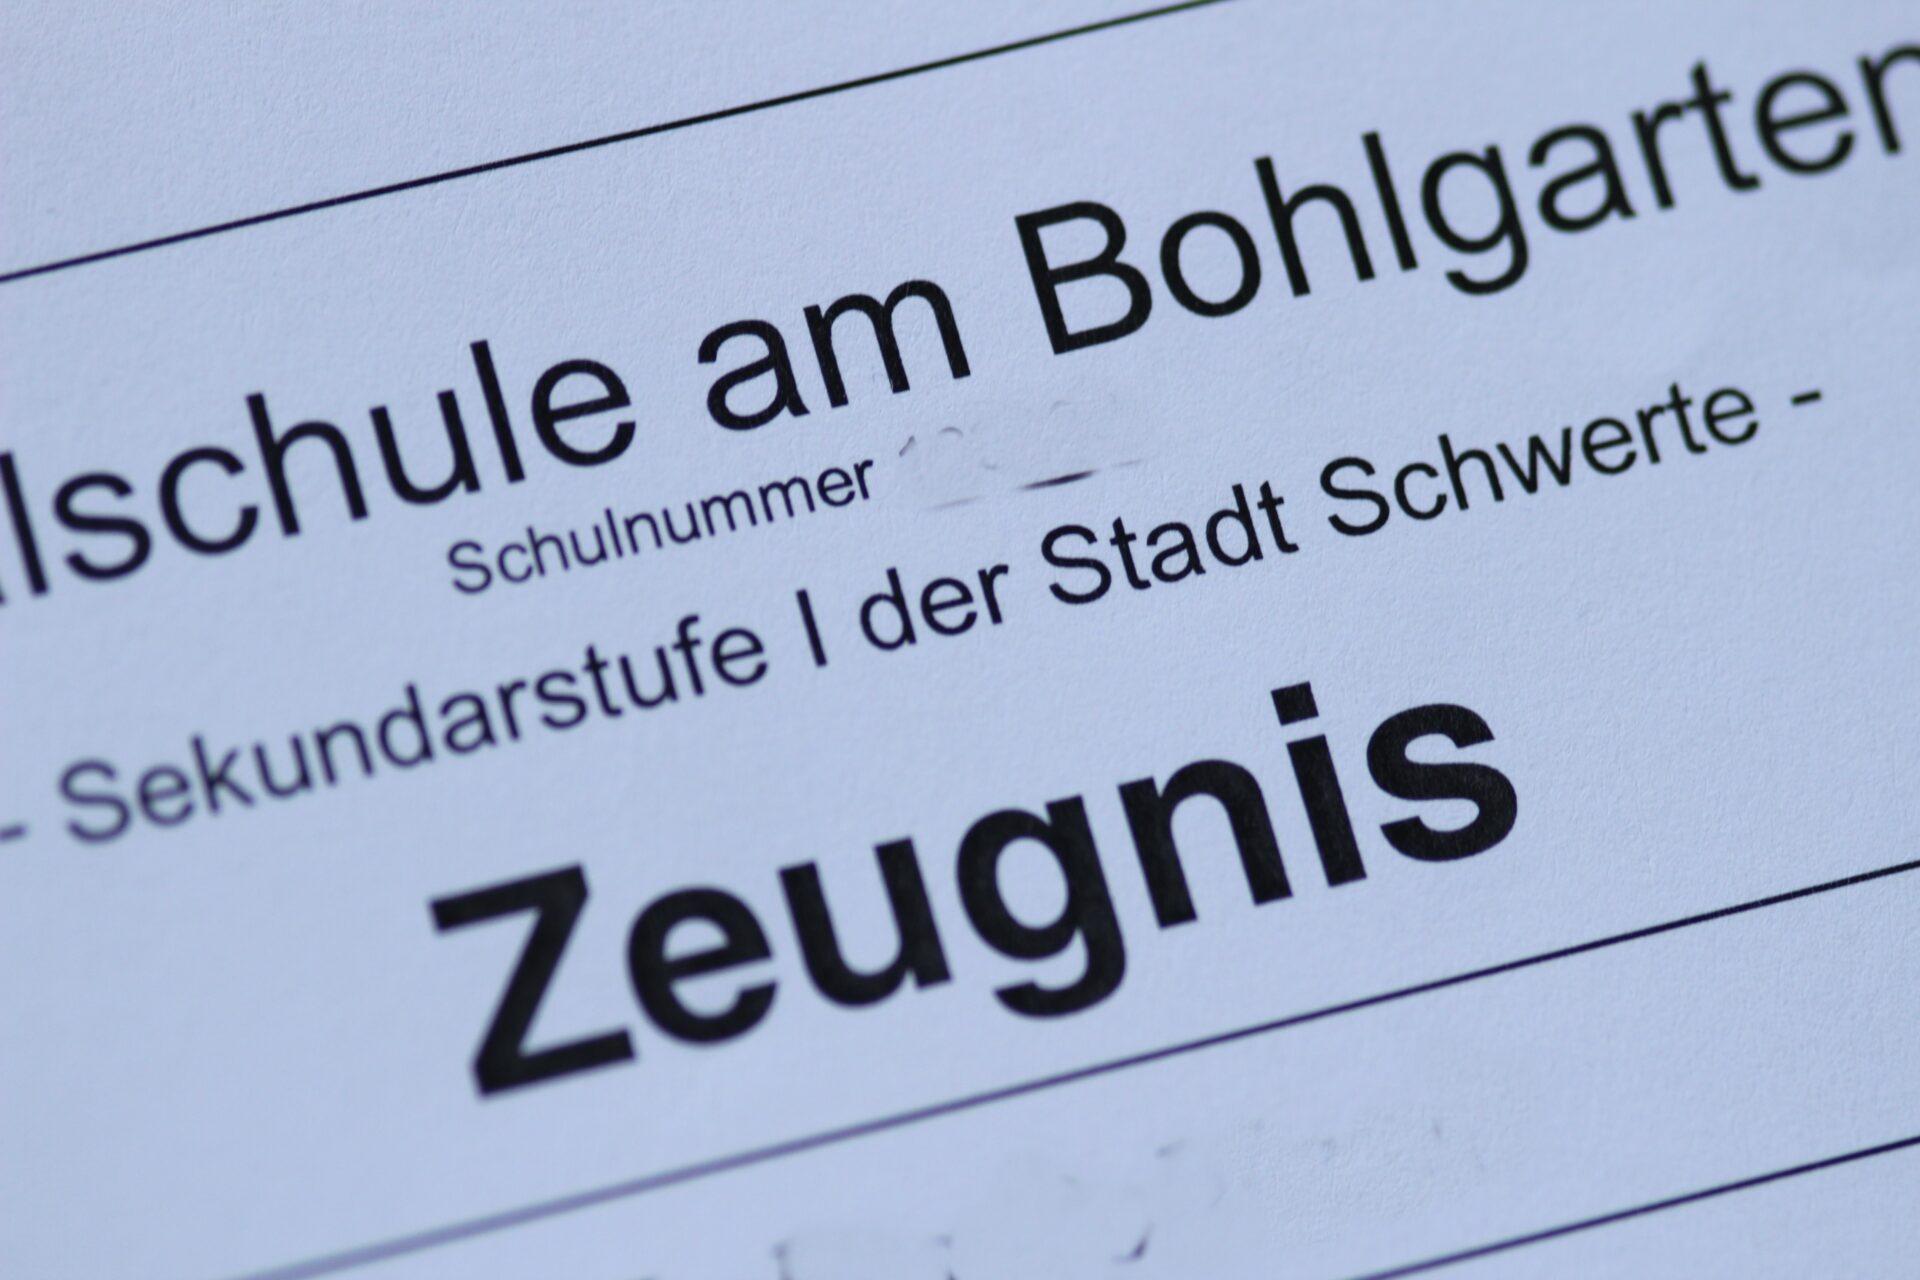 Zeugnisse: Bezirksregierung bietet wieder Beratung an